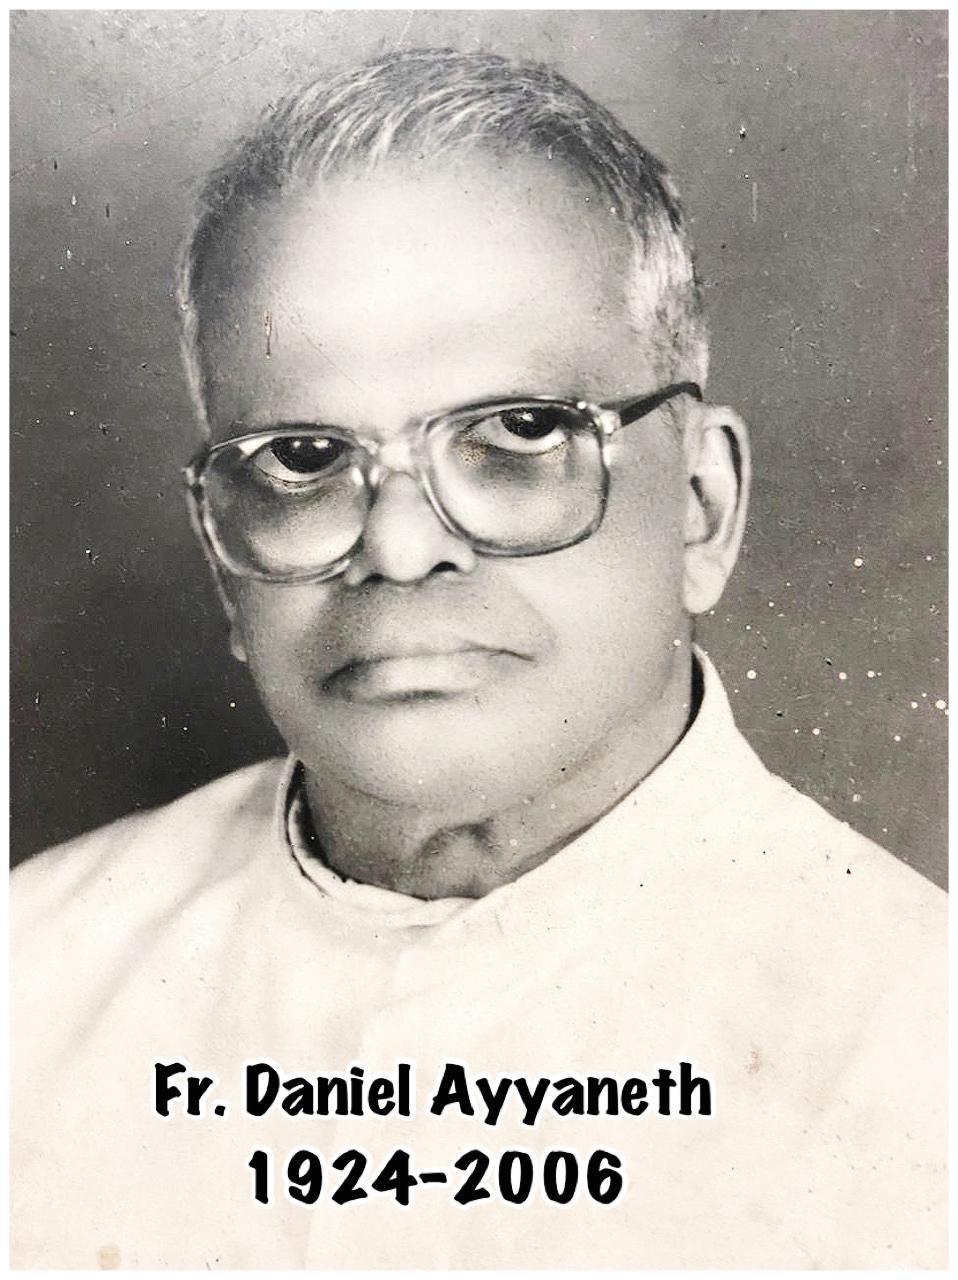 Rev. Fr Daniel Ayyaneth (1924-2006)